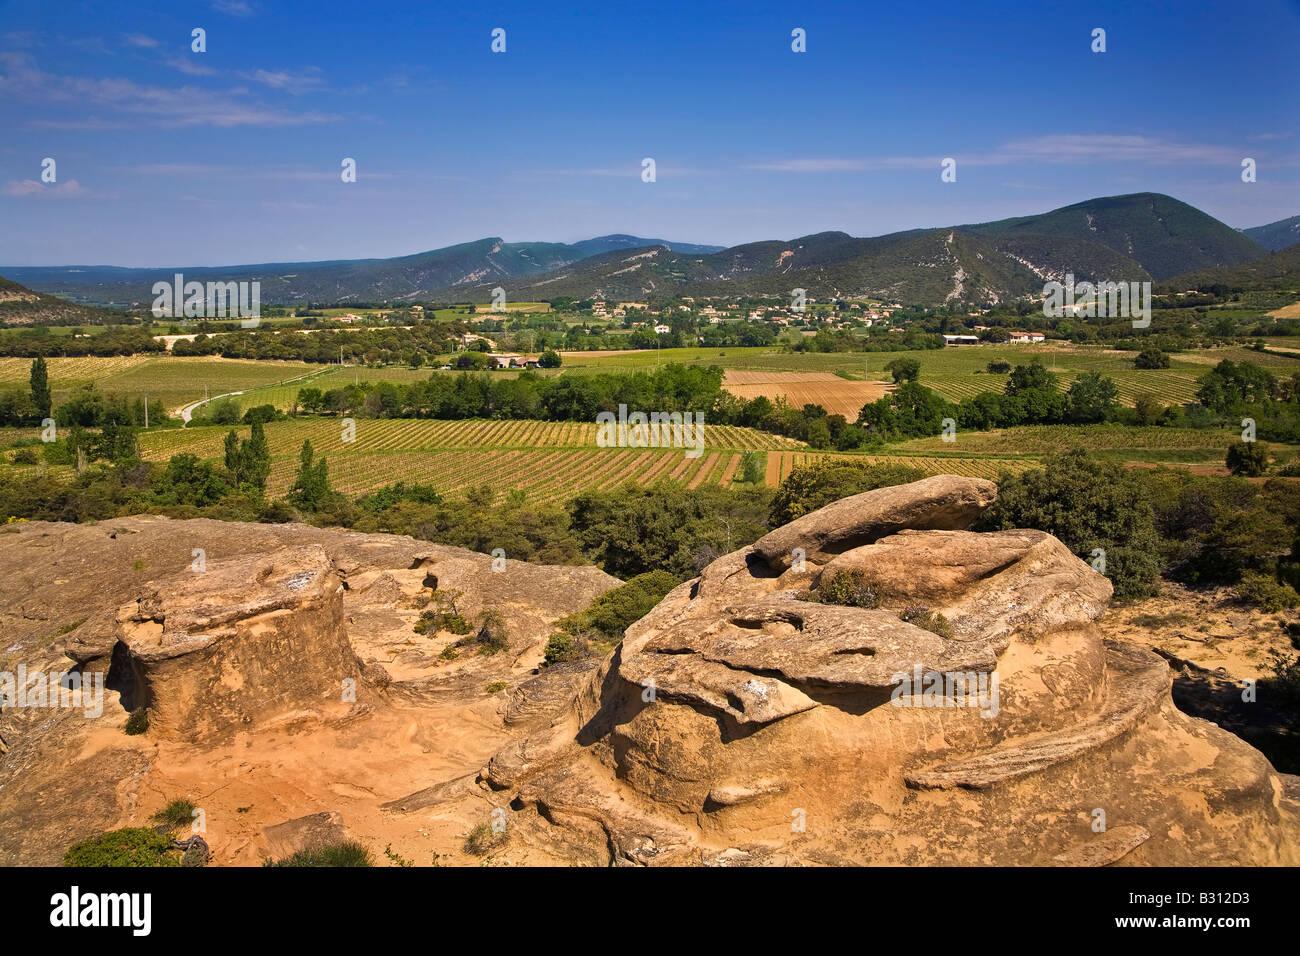 Strangely Shaped Rocks, from Water Erosion, Near Rousset des Vignes, Provence, France - Stock Image